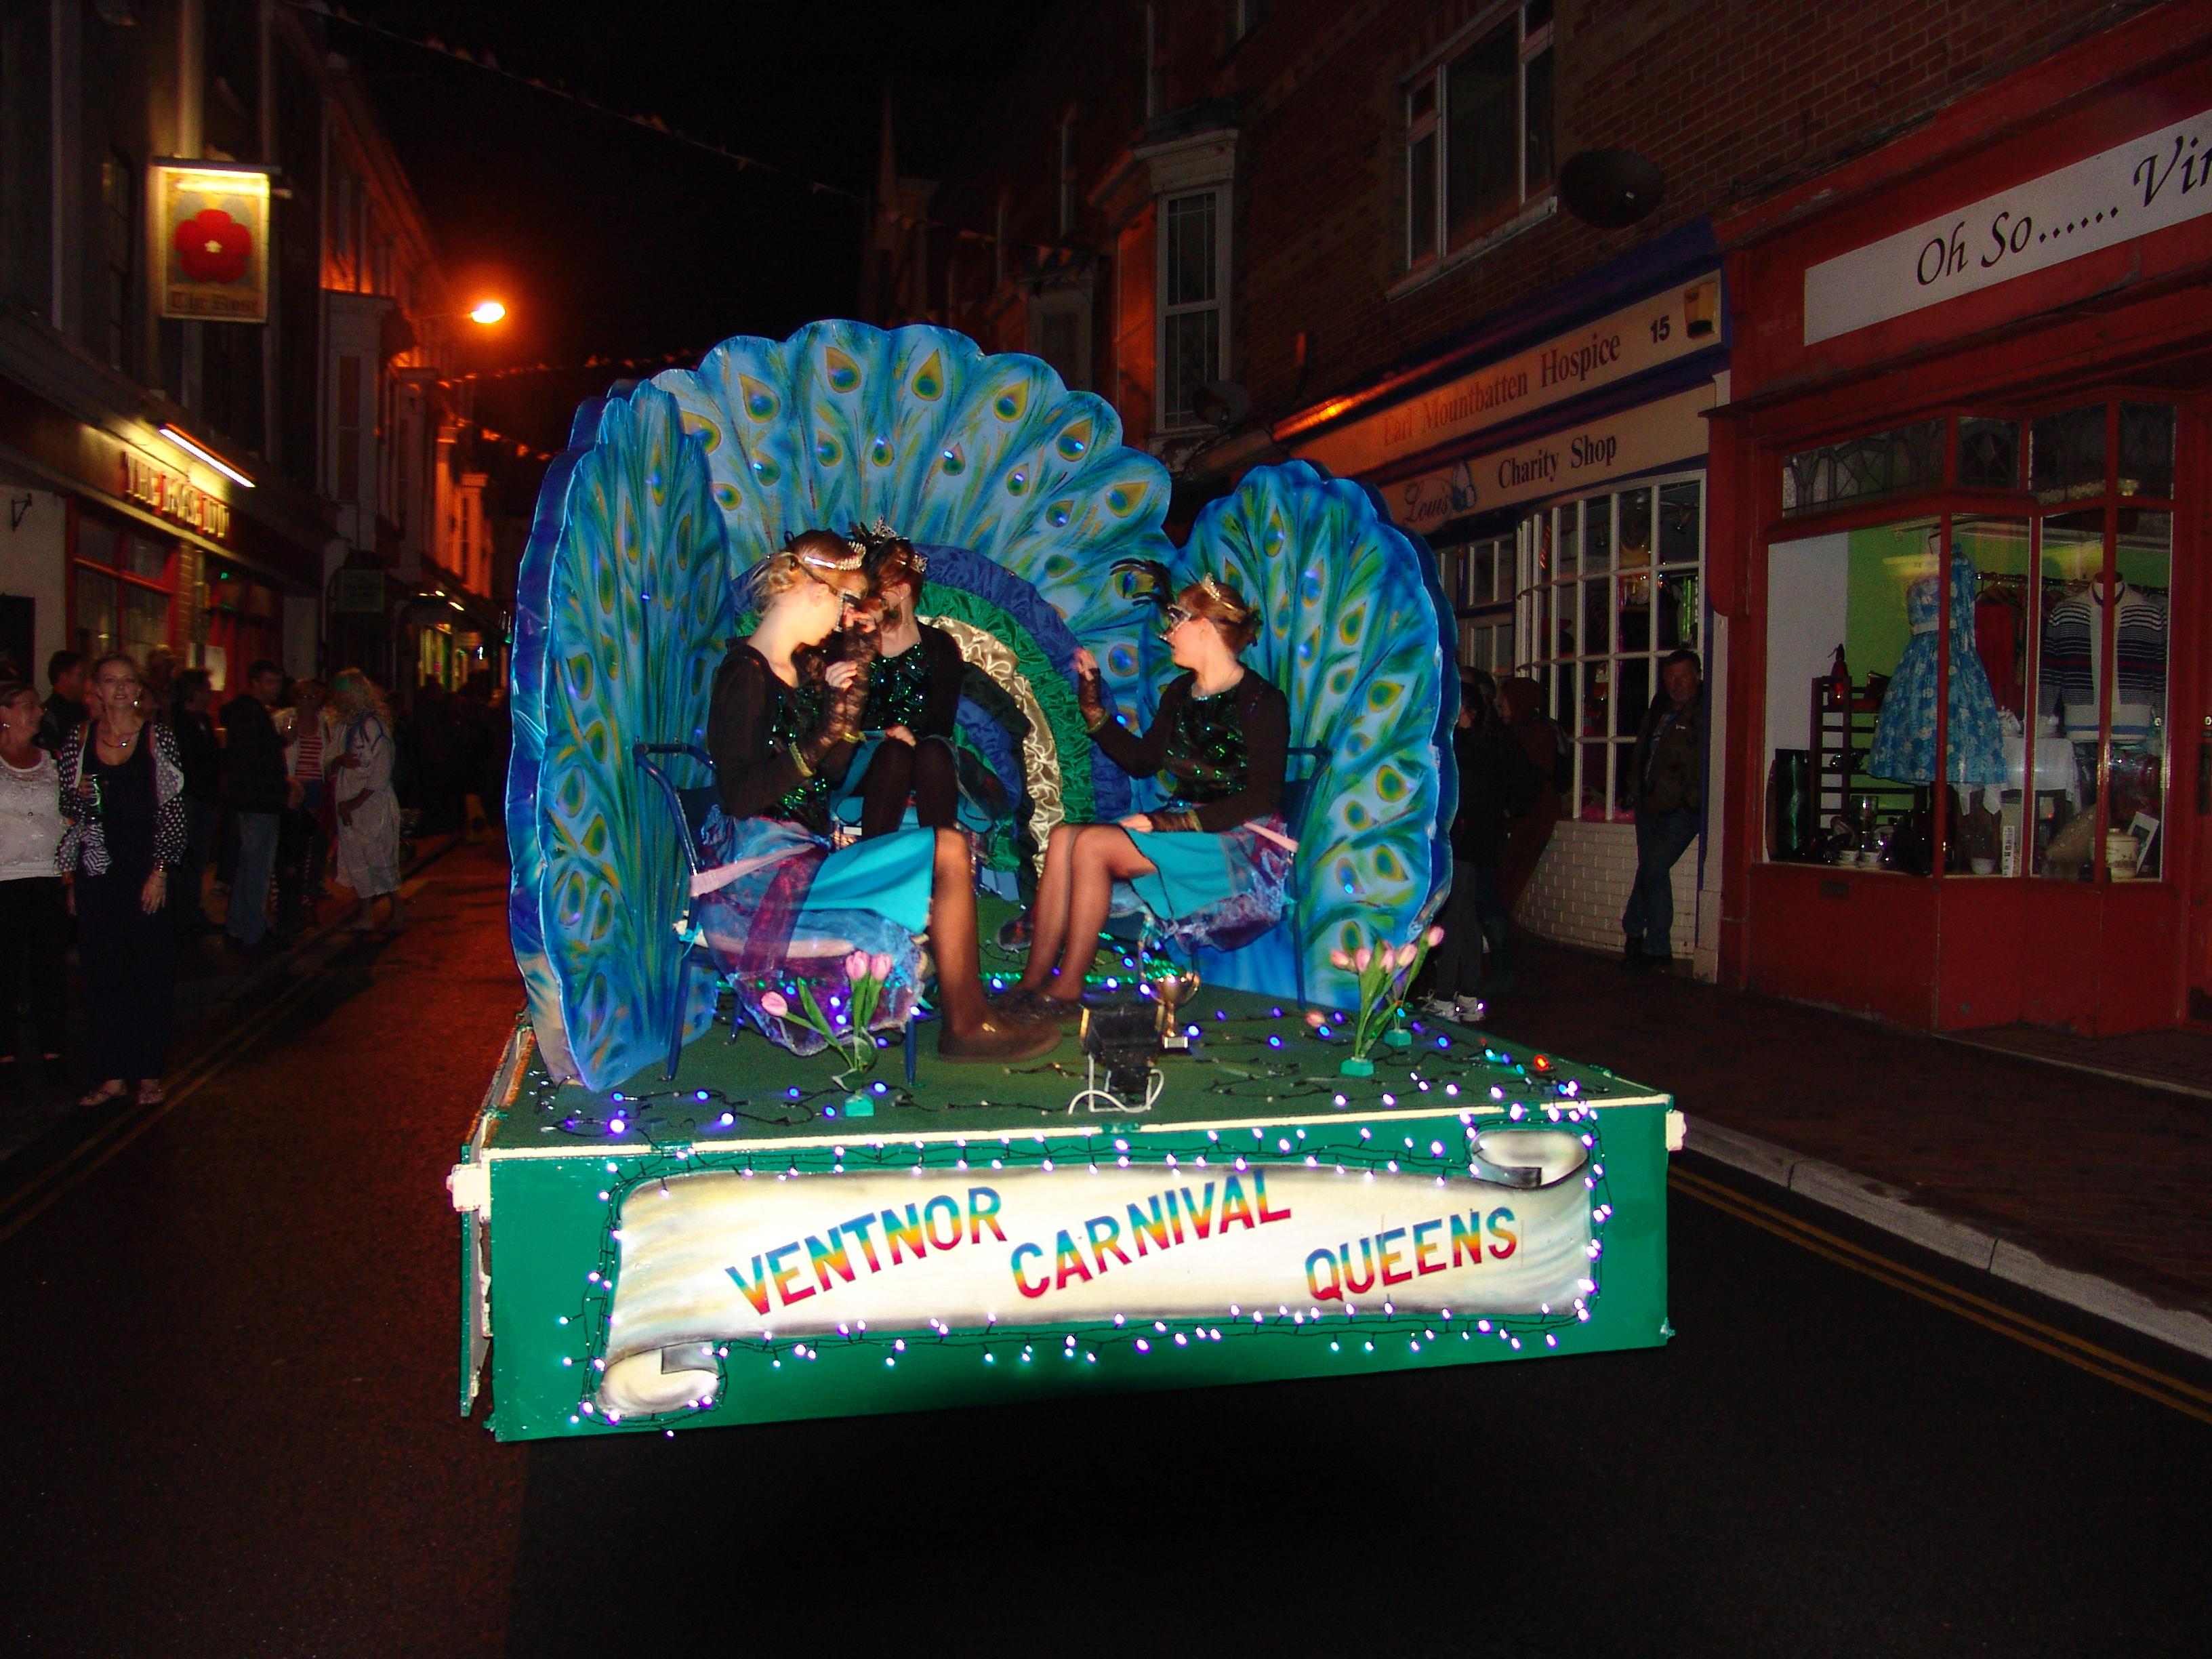 Ventnor Carnival Queens